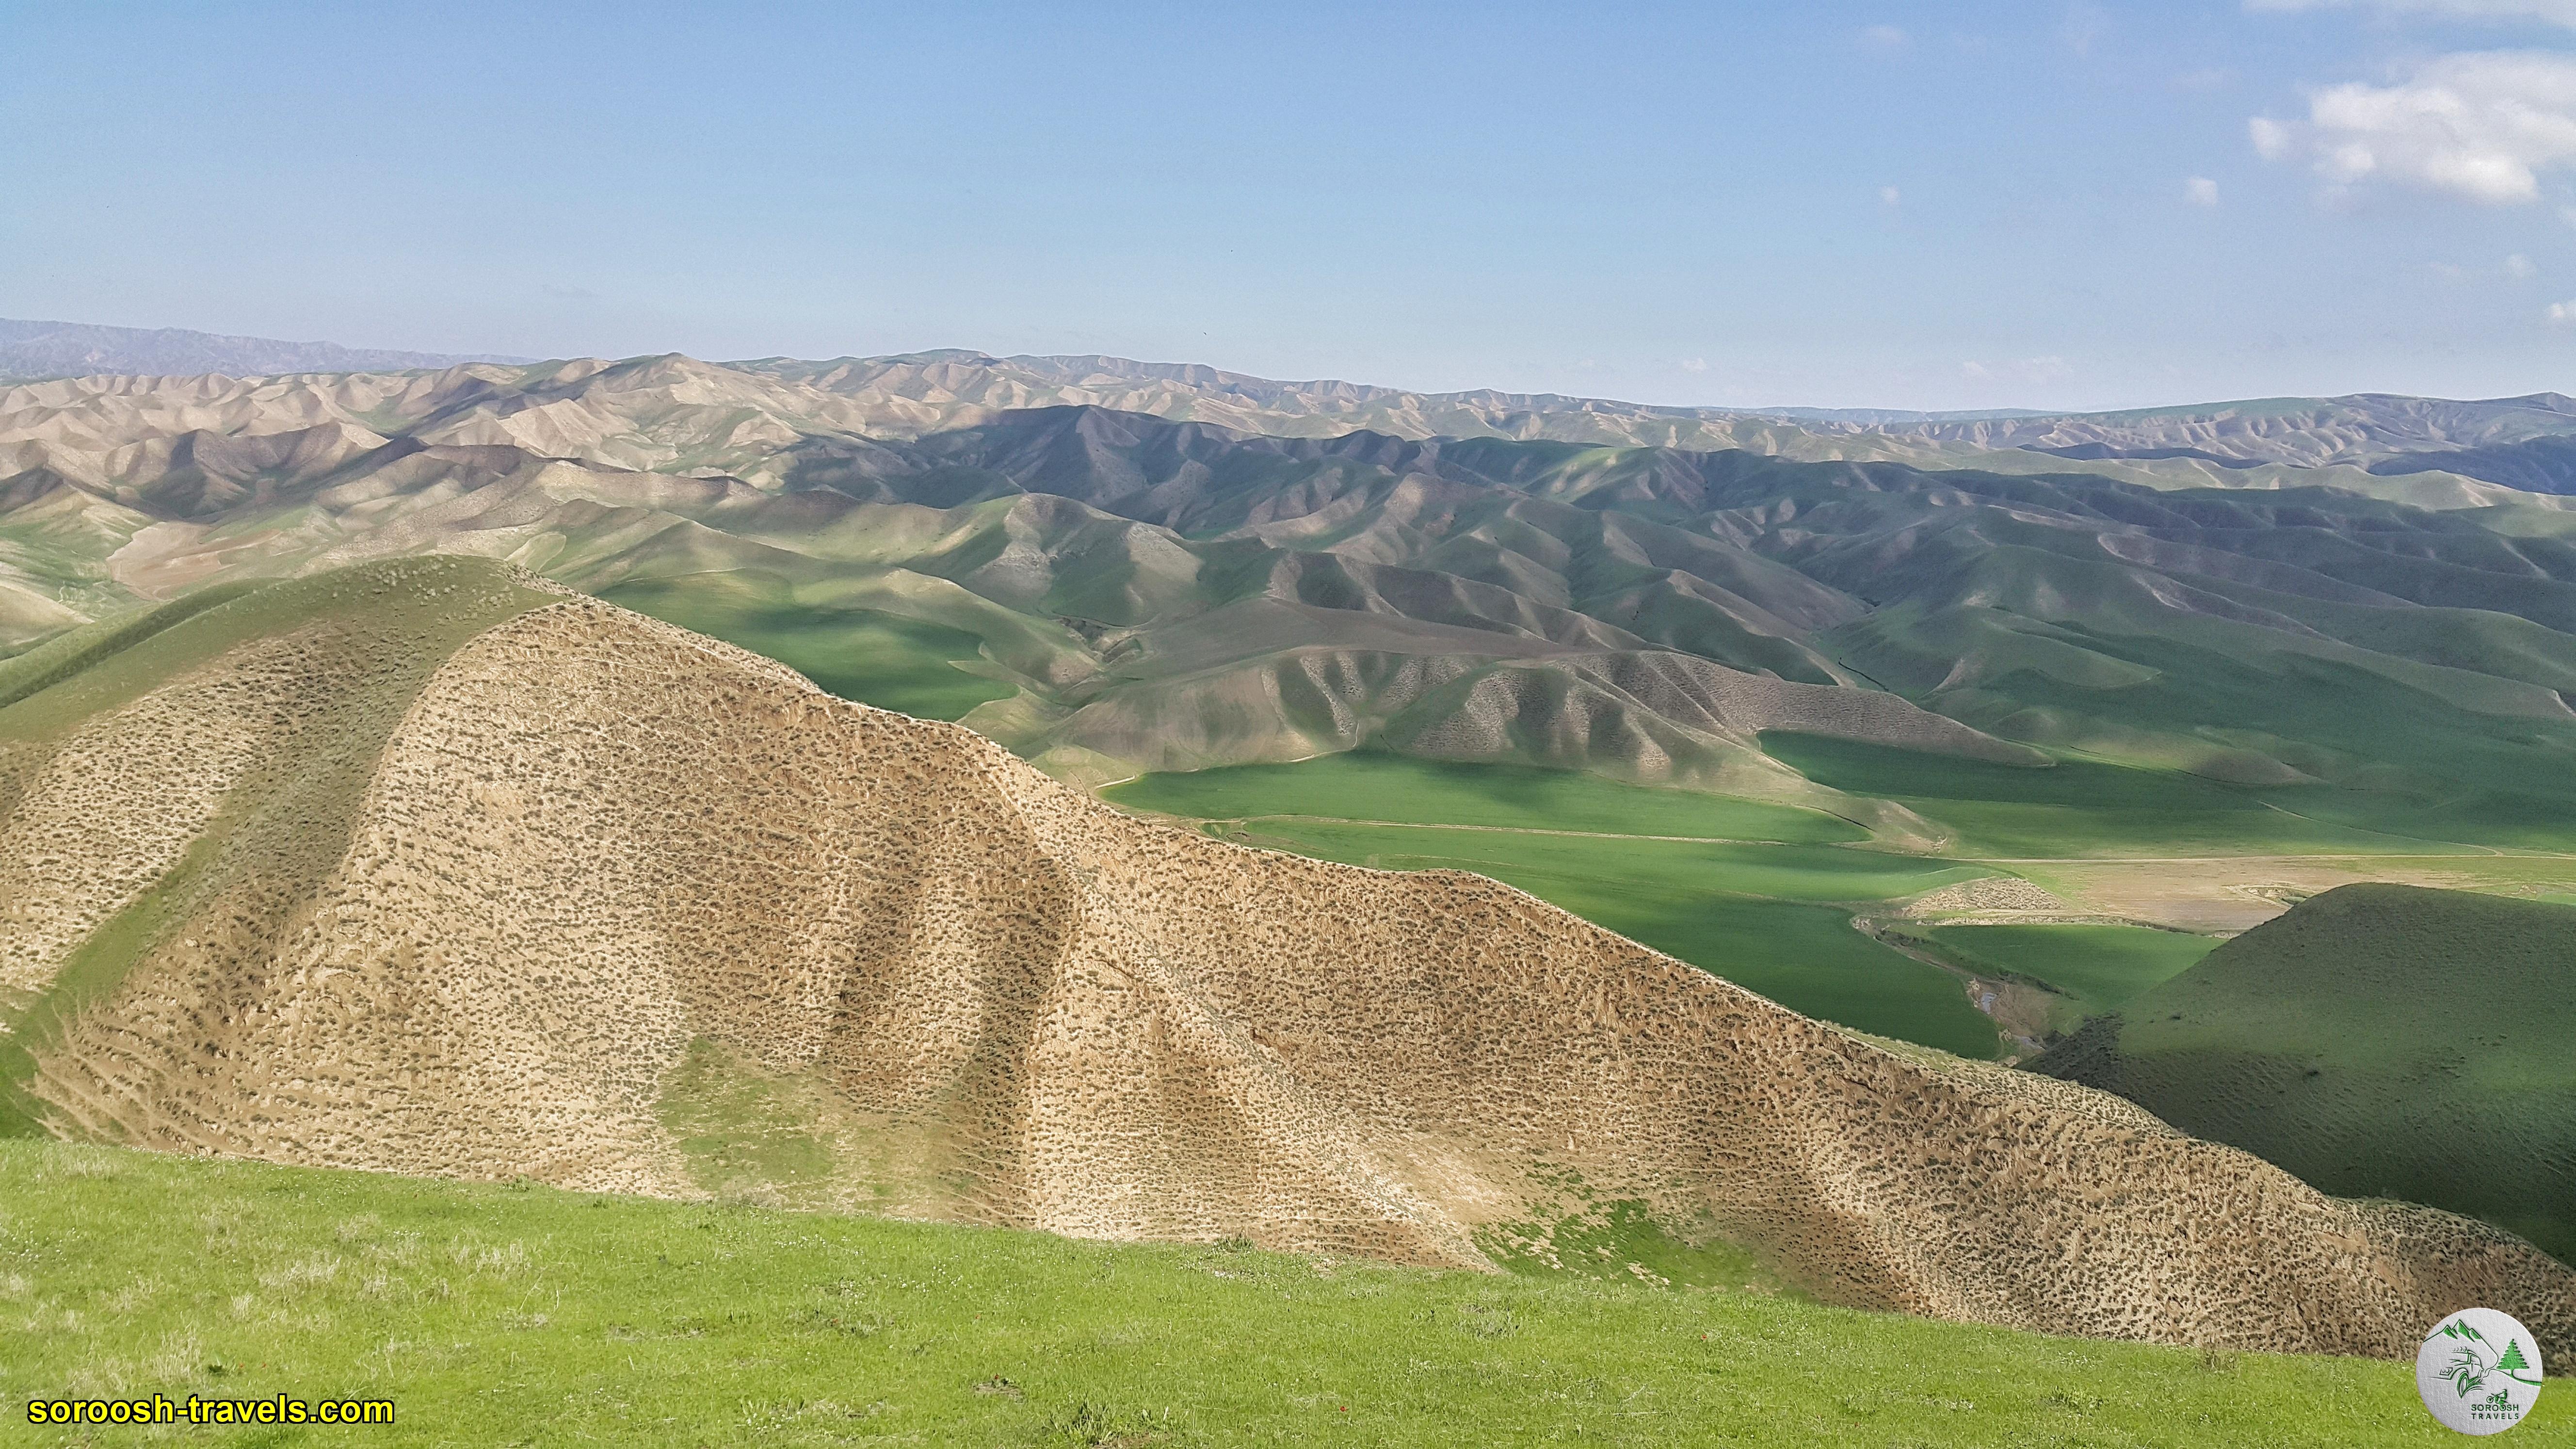 منطقه تورکمن صحرا - نوروز 1400